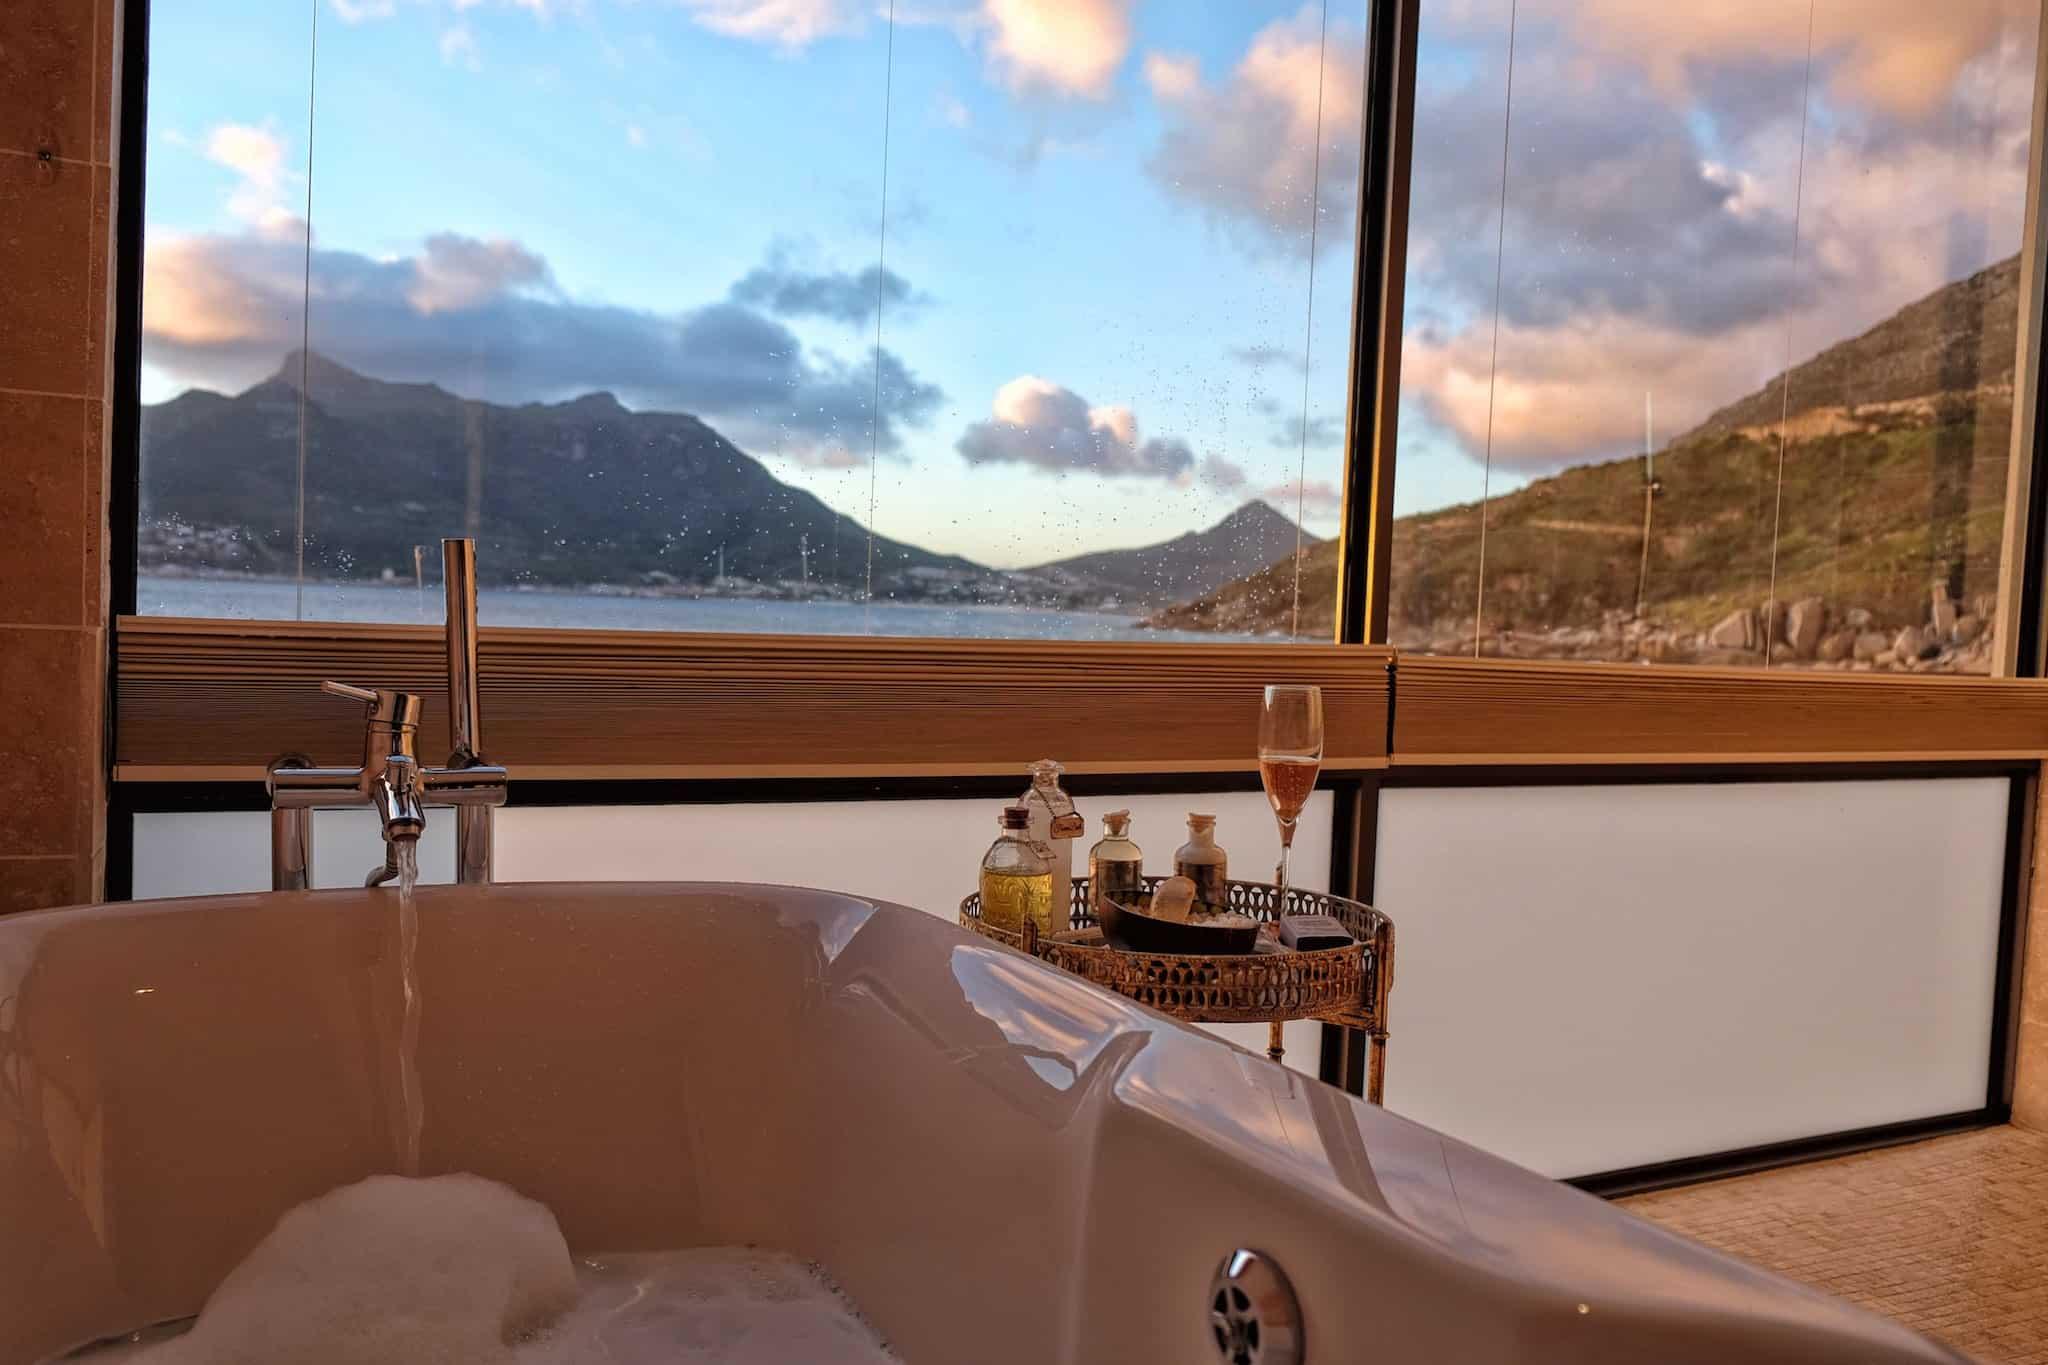 bath-time-at-tintswalo